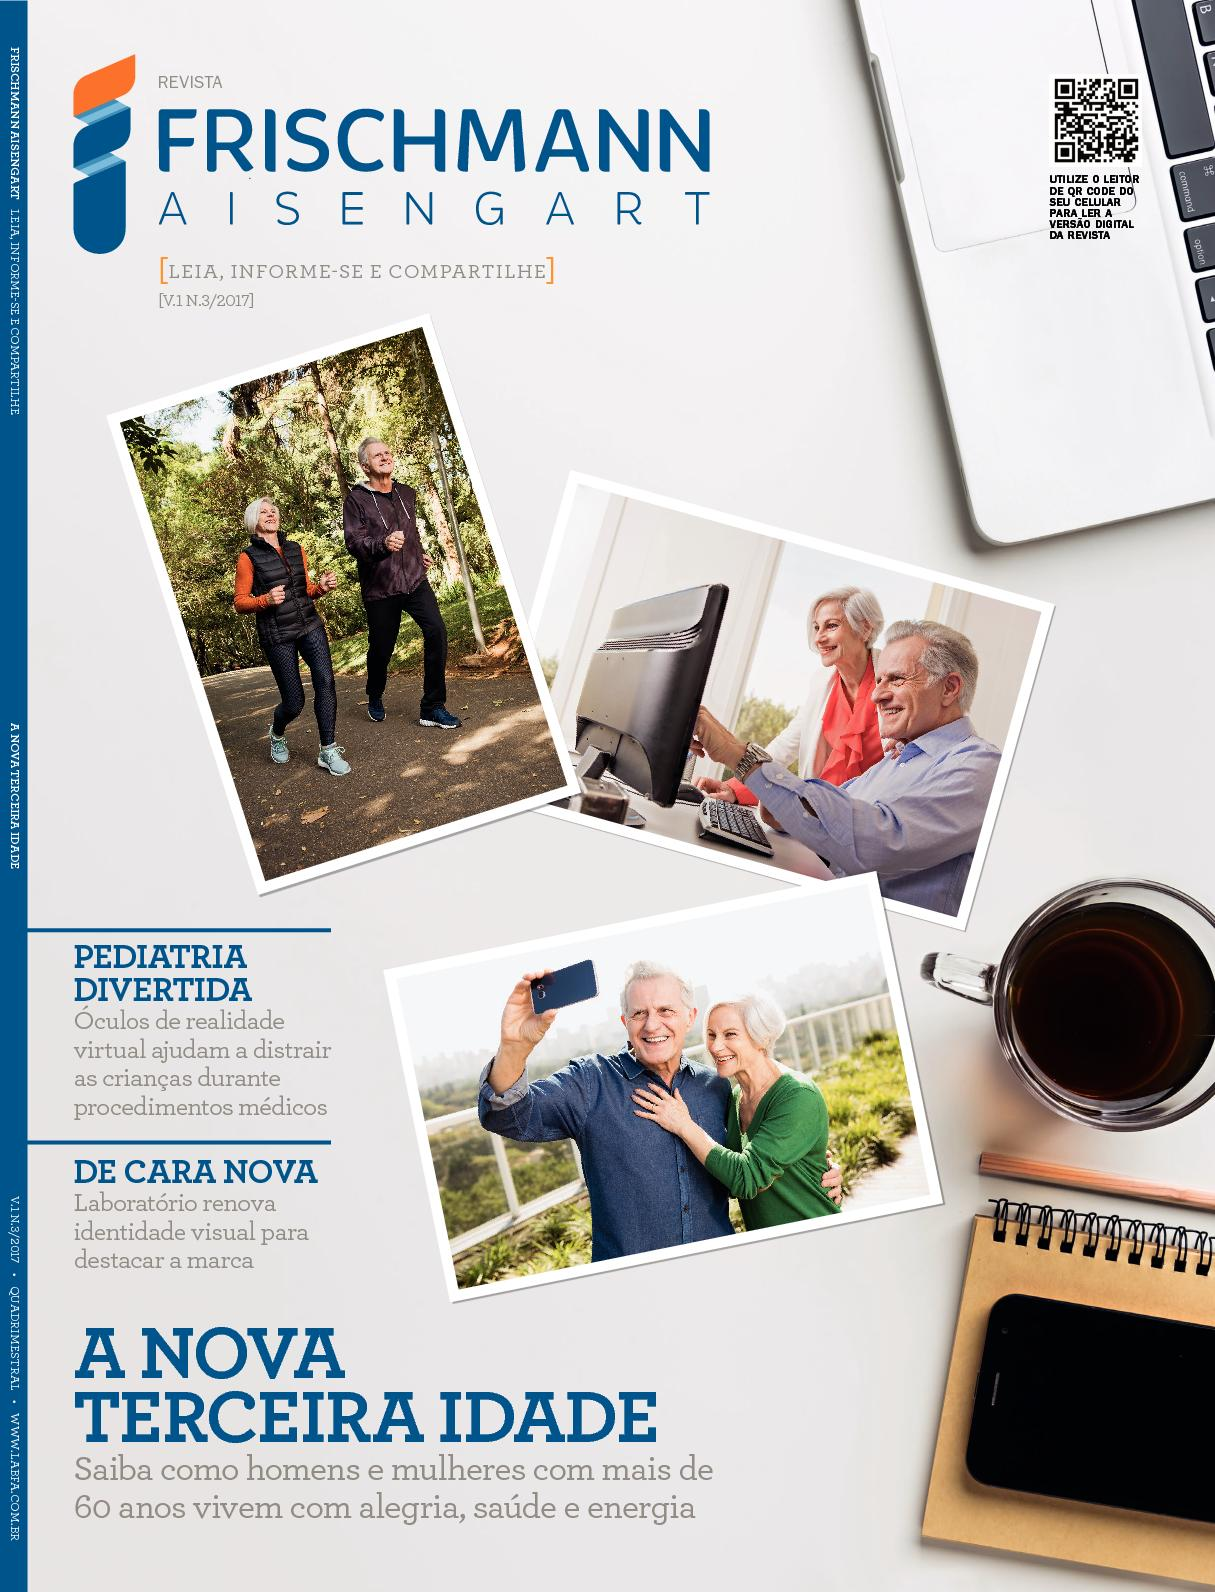 Calaméo - Revista Frischmann ac617ac1ac